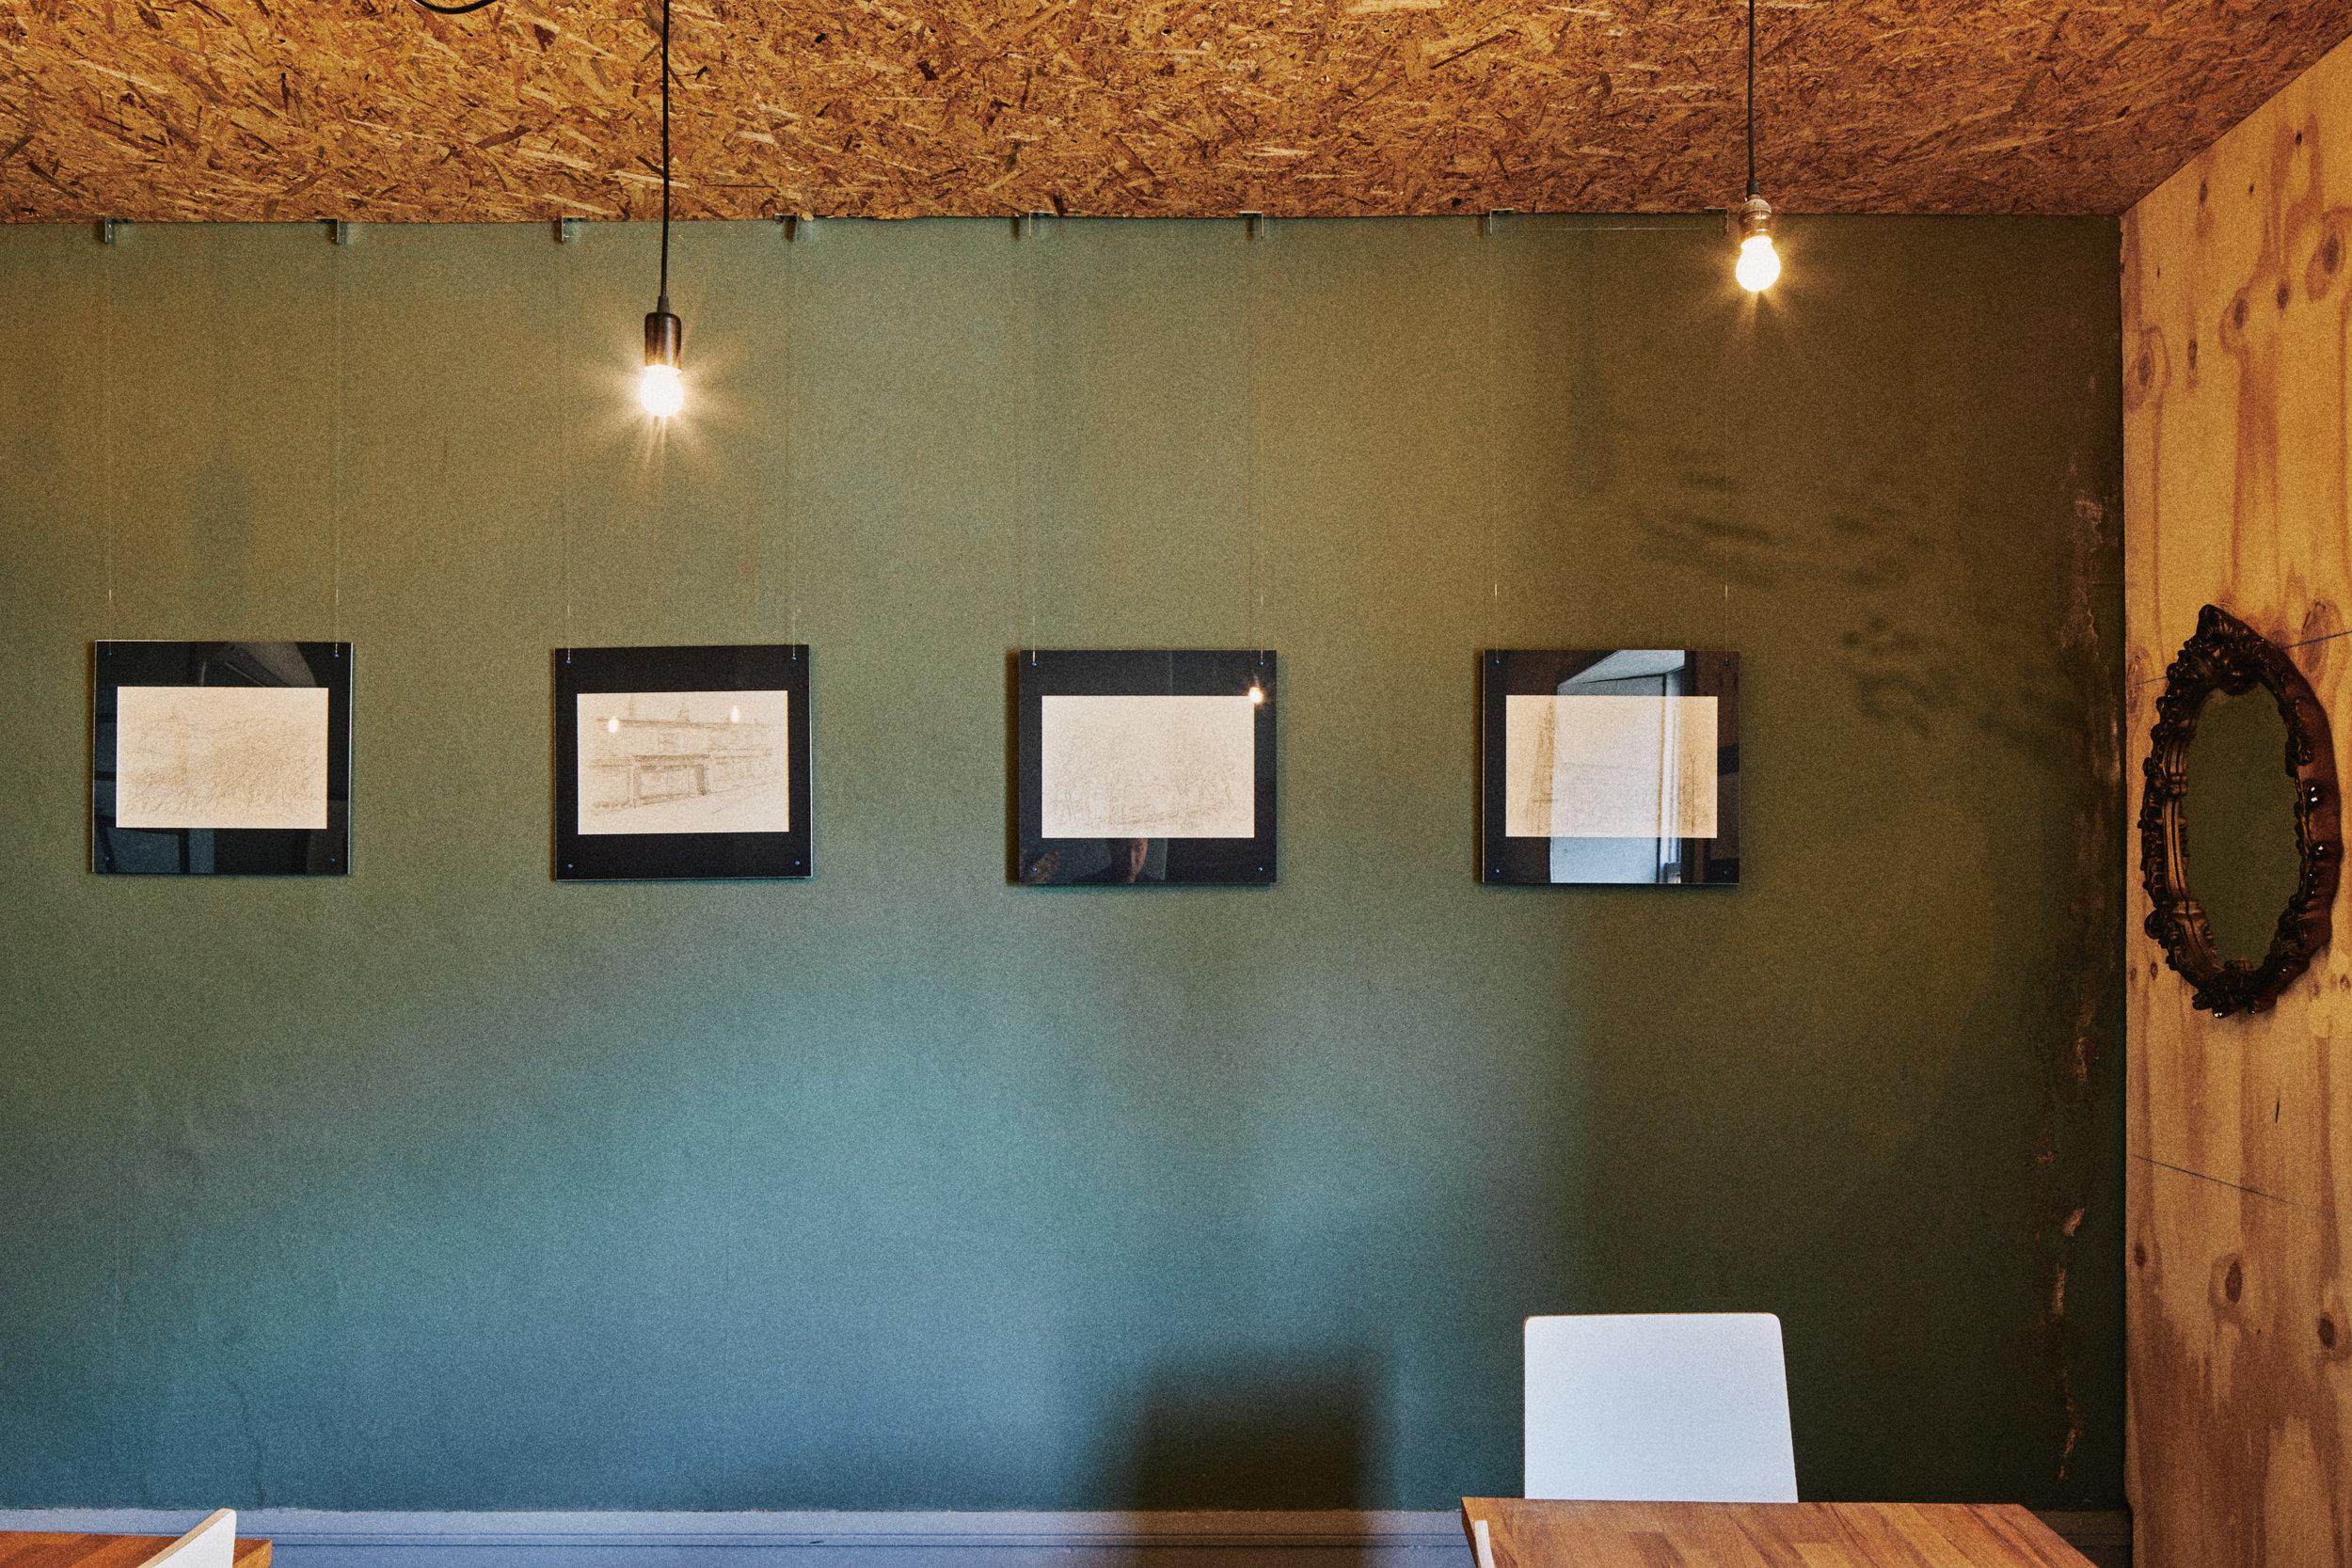 tea_atelier_180925_tea_atelier_interior_0012.jpg